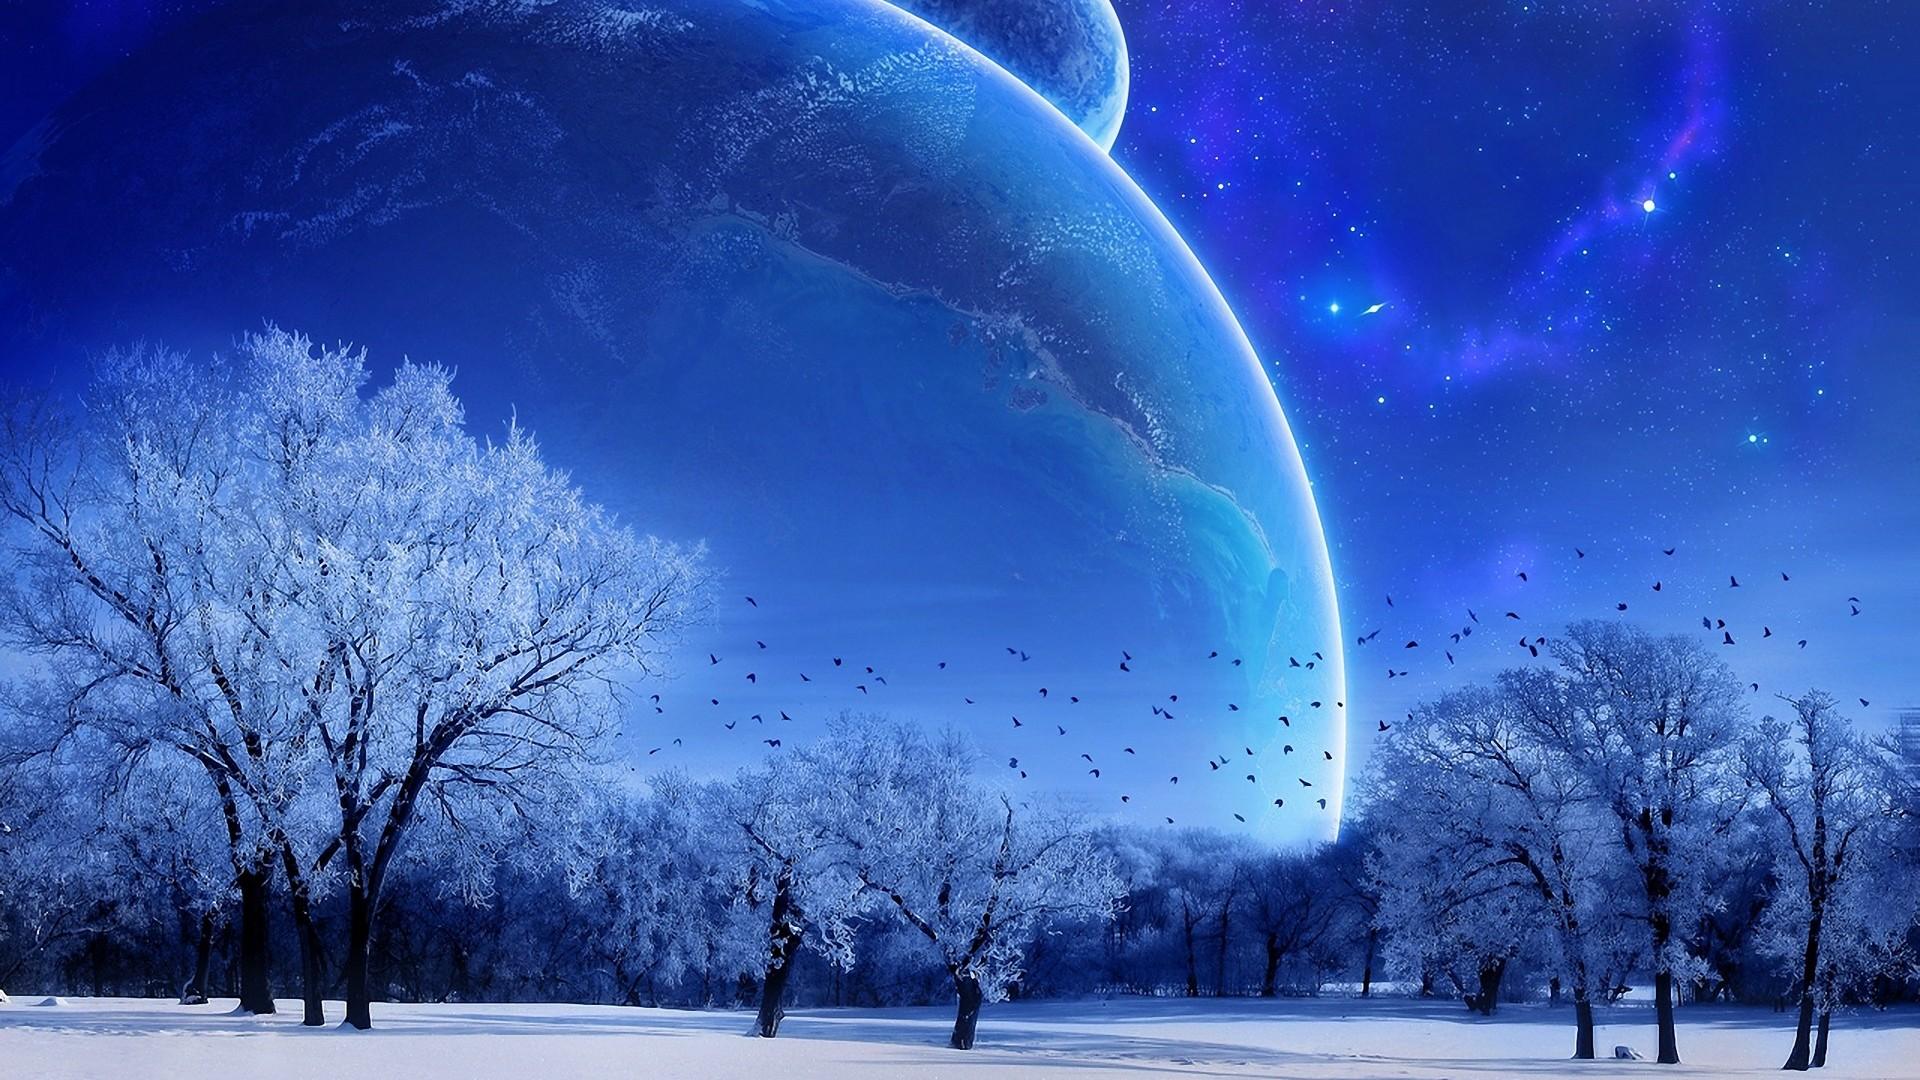 blue-cold-night-big-moon-in-the-winter-season_1920x1080